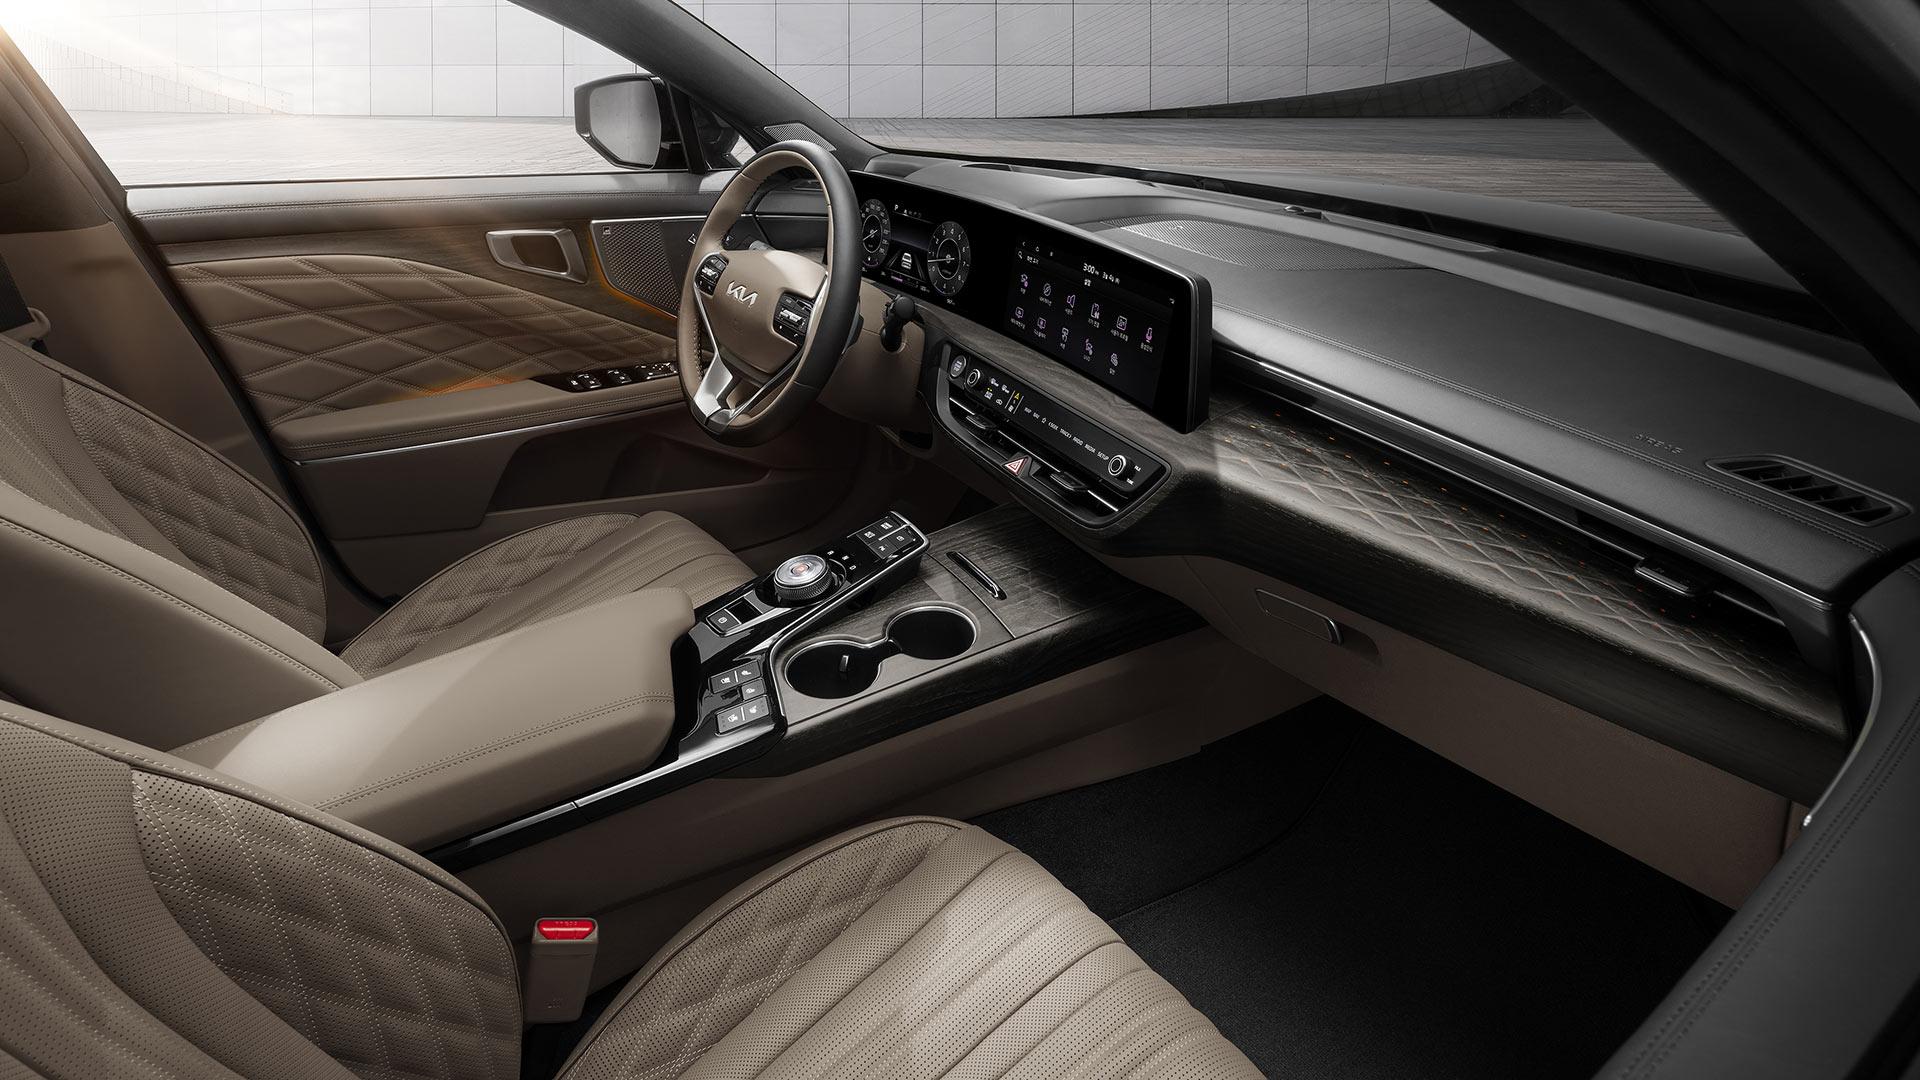 The Kia K8 Interior